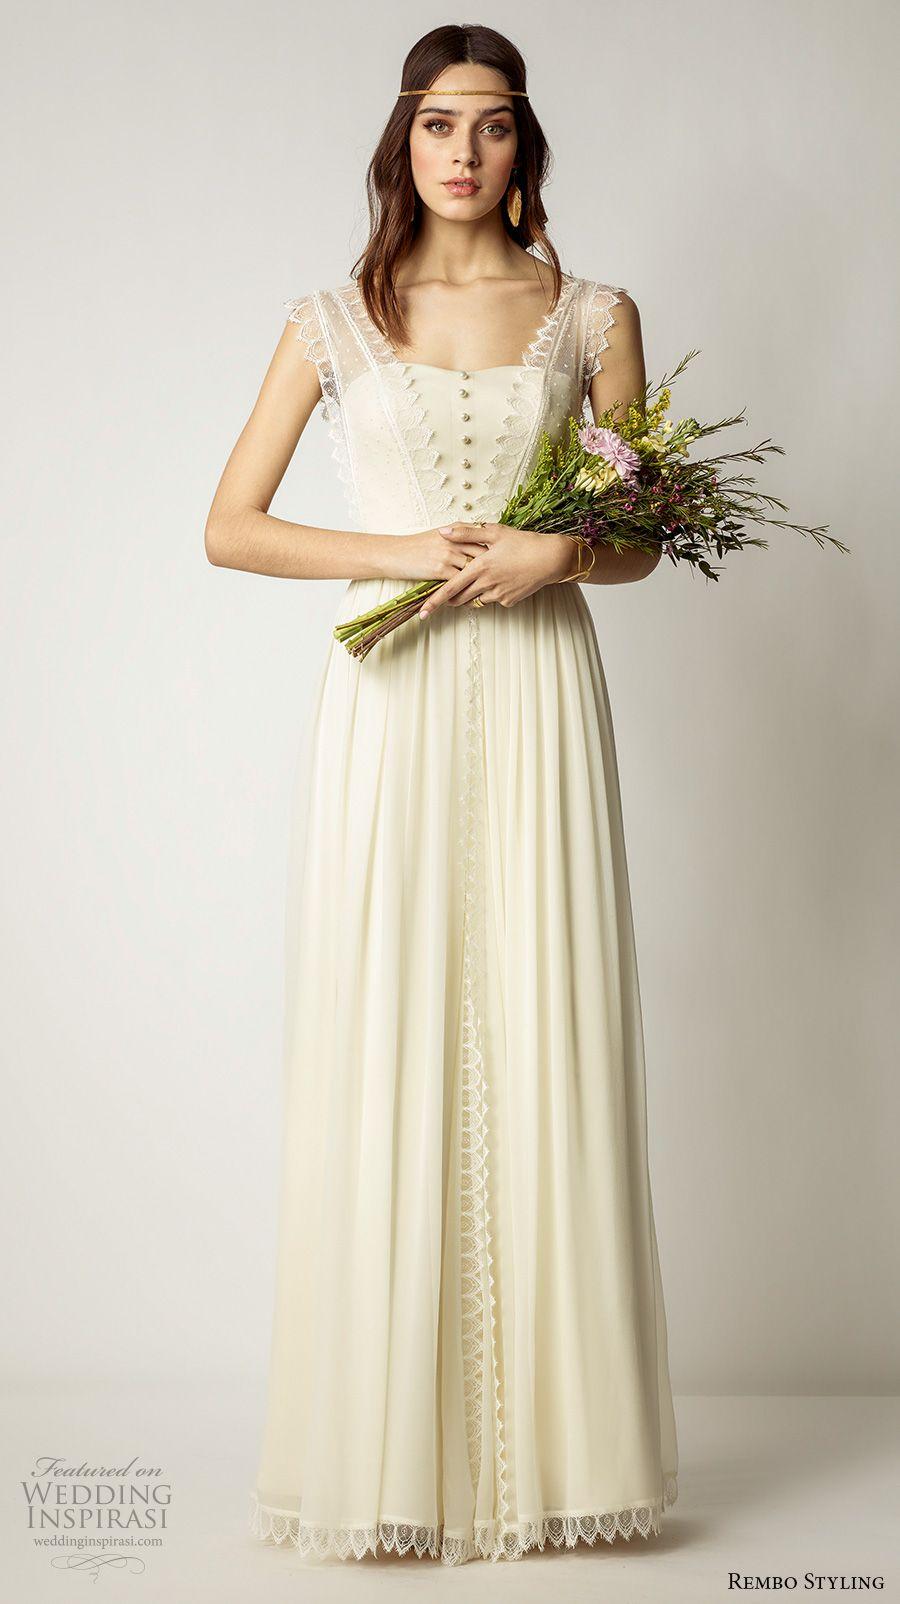 Rembo Styling 16 Wedding Dresses  Chiffon hochzeitskleid, Kleid